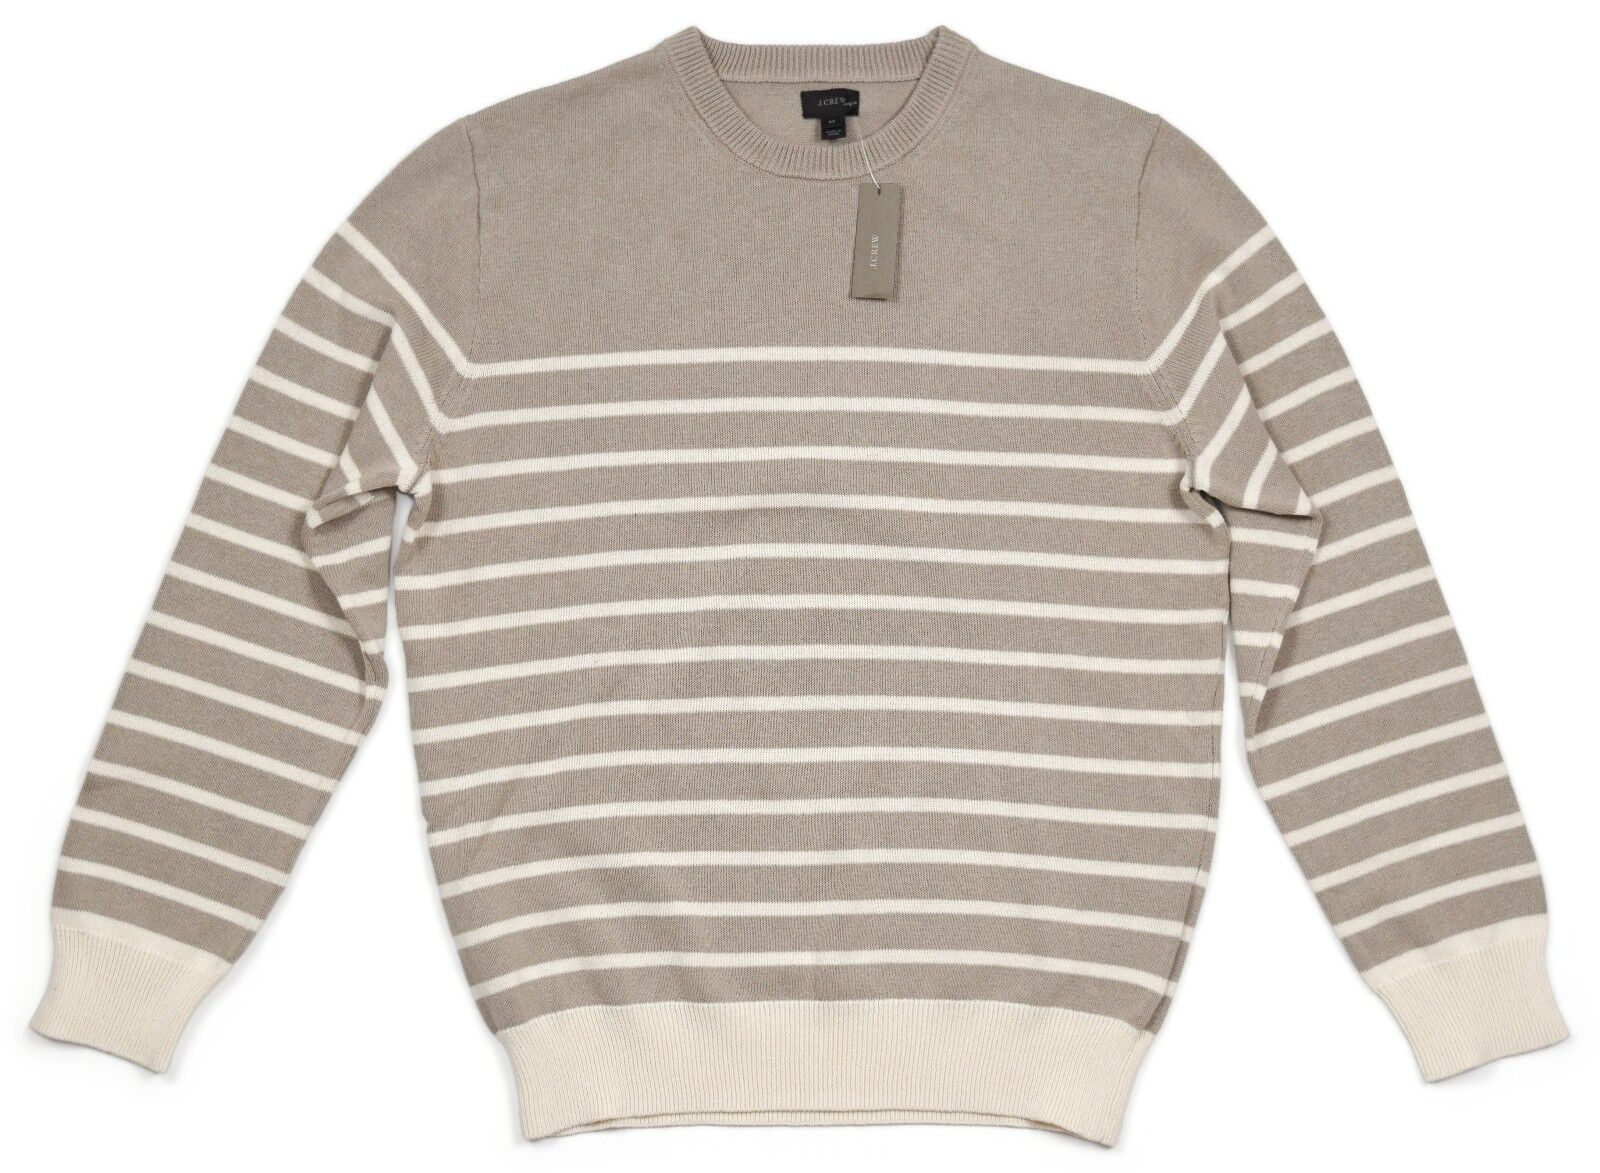 NEW J.Crew Men's Medium Striped Cotton Sweater in Pumice (Tan   Ivory) NWT